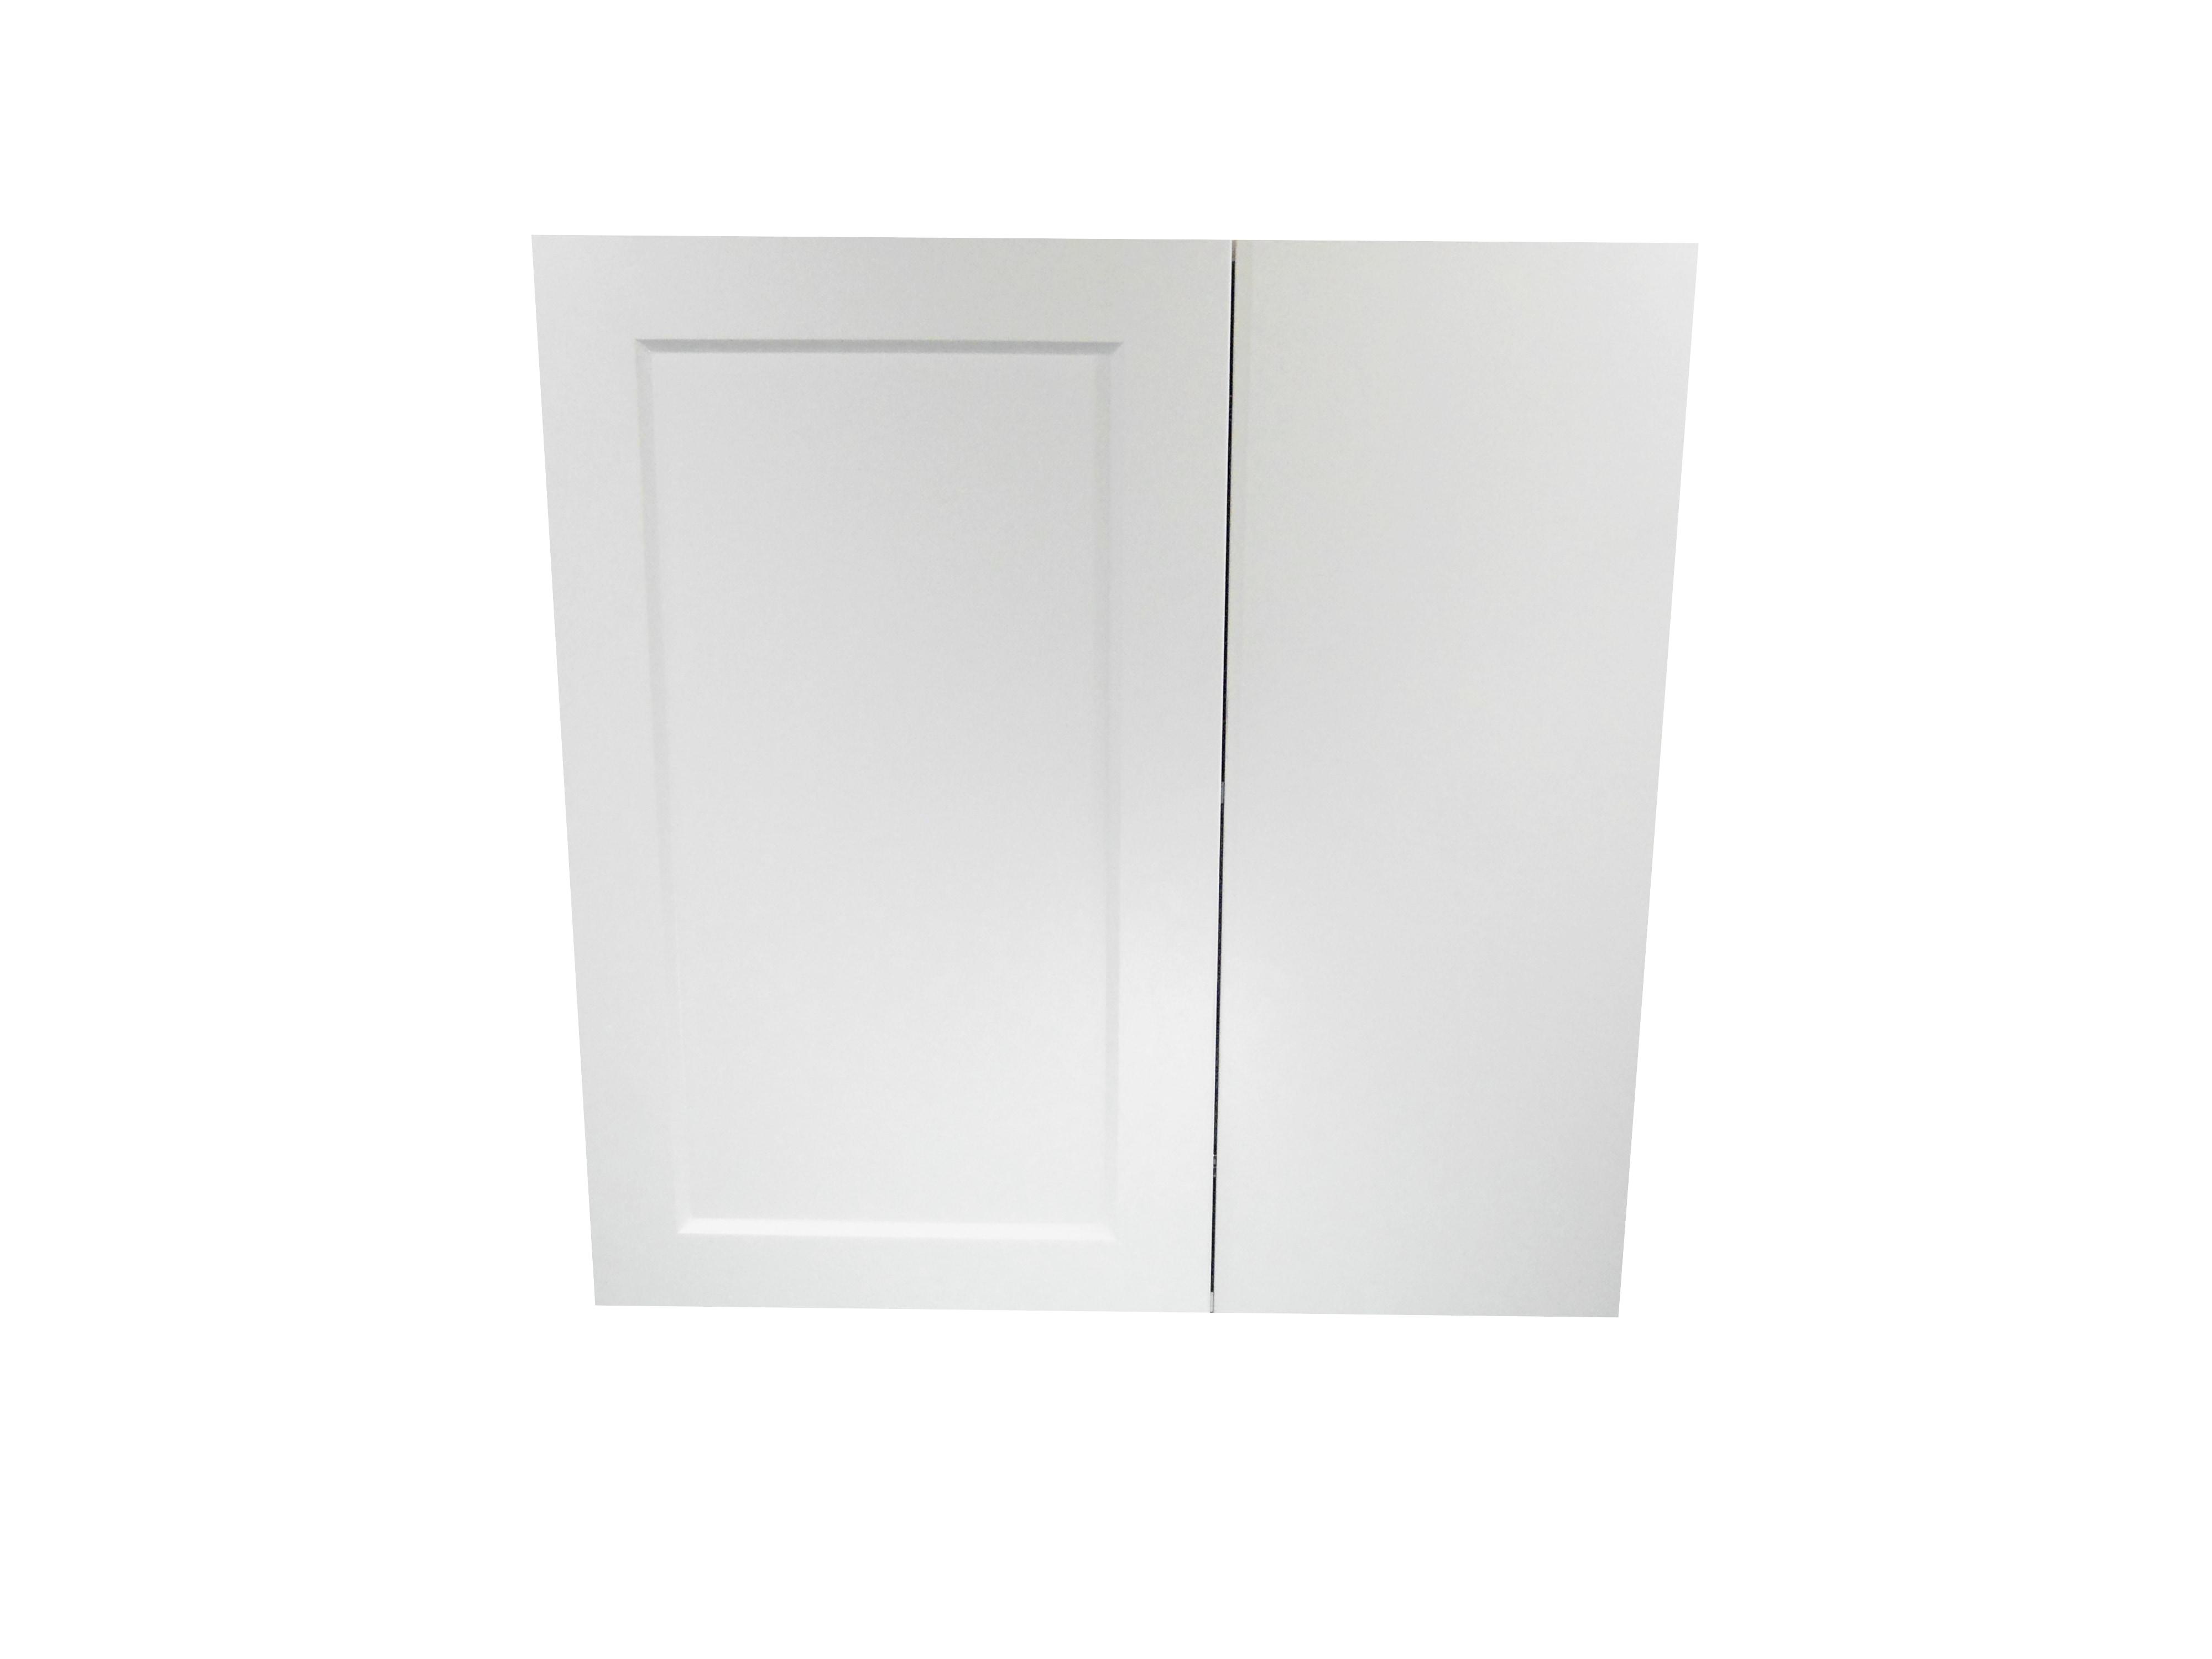 Blind Wall Cabinet / Wistler White / Flat Panel White / 24x24x30 Whistler White 0